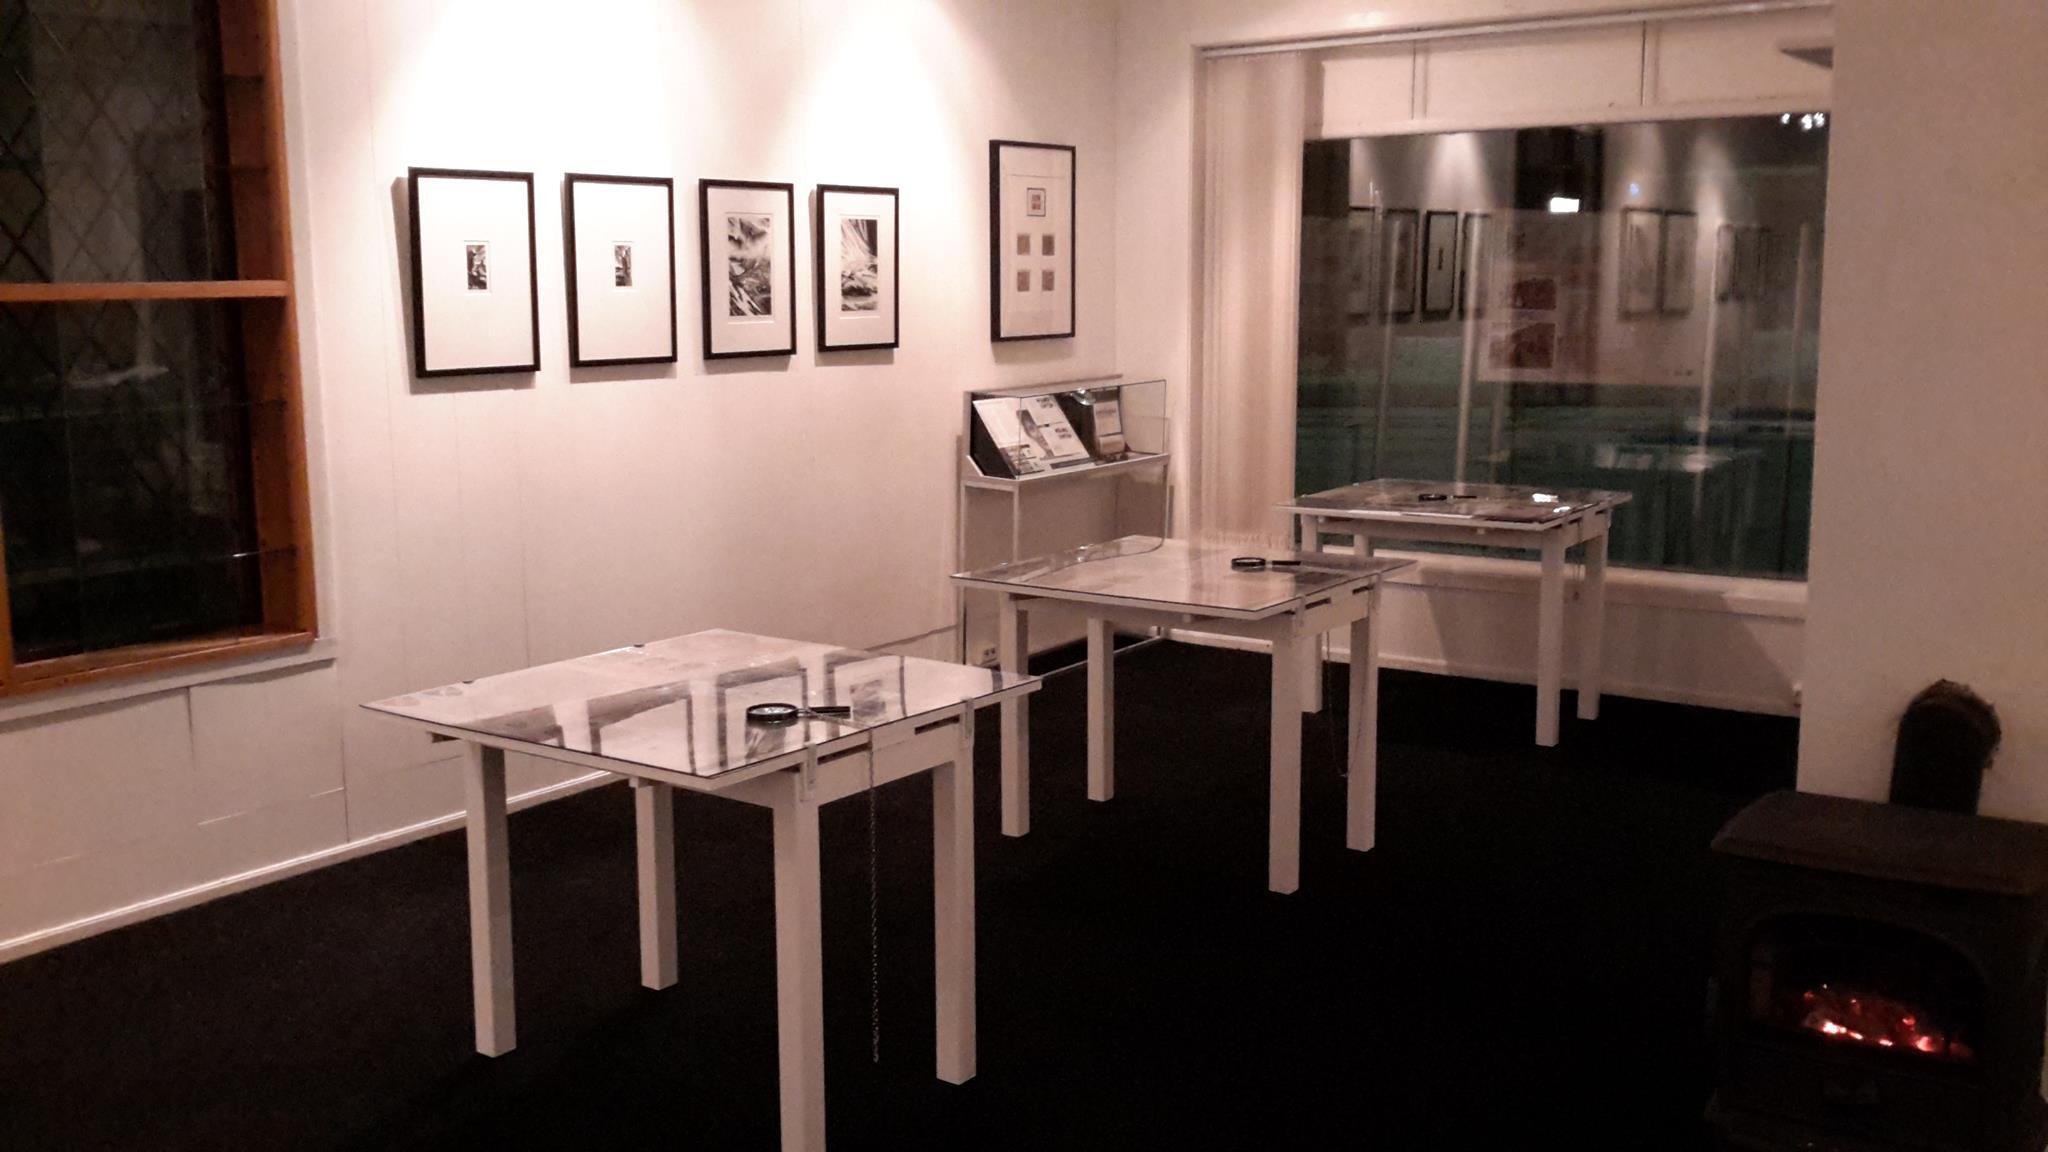 Sverre Morkens utstilling på plass i galleriet